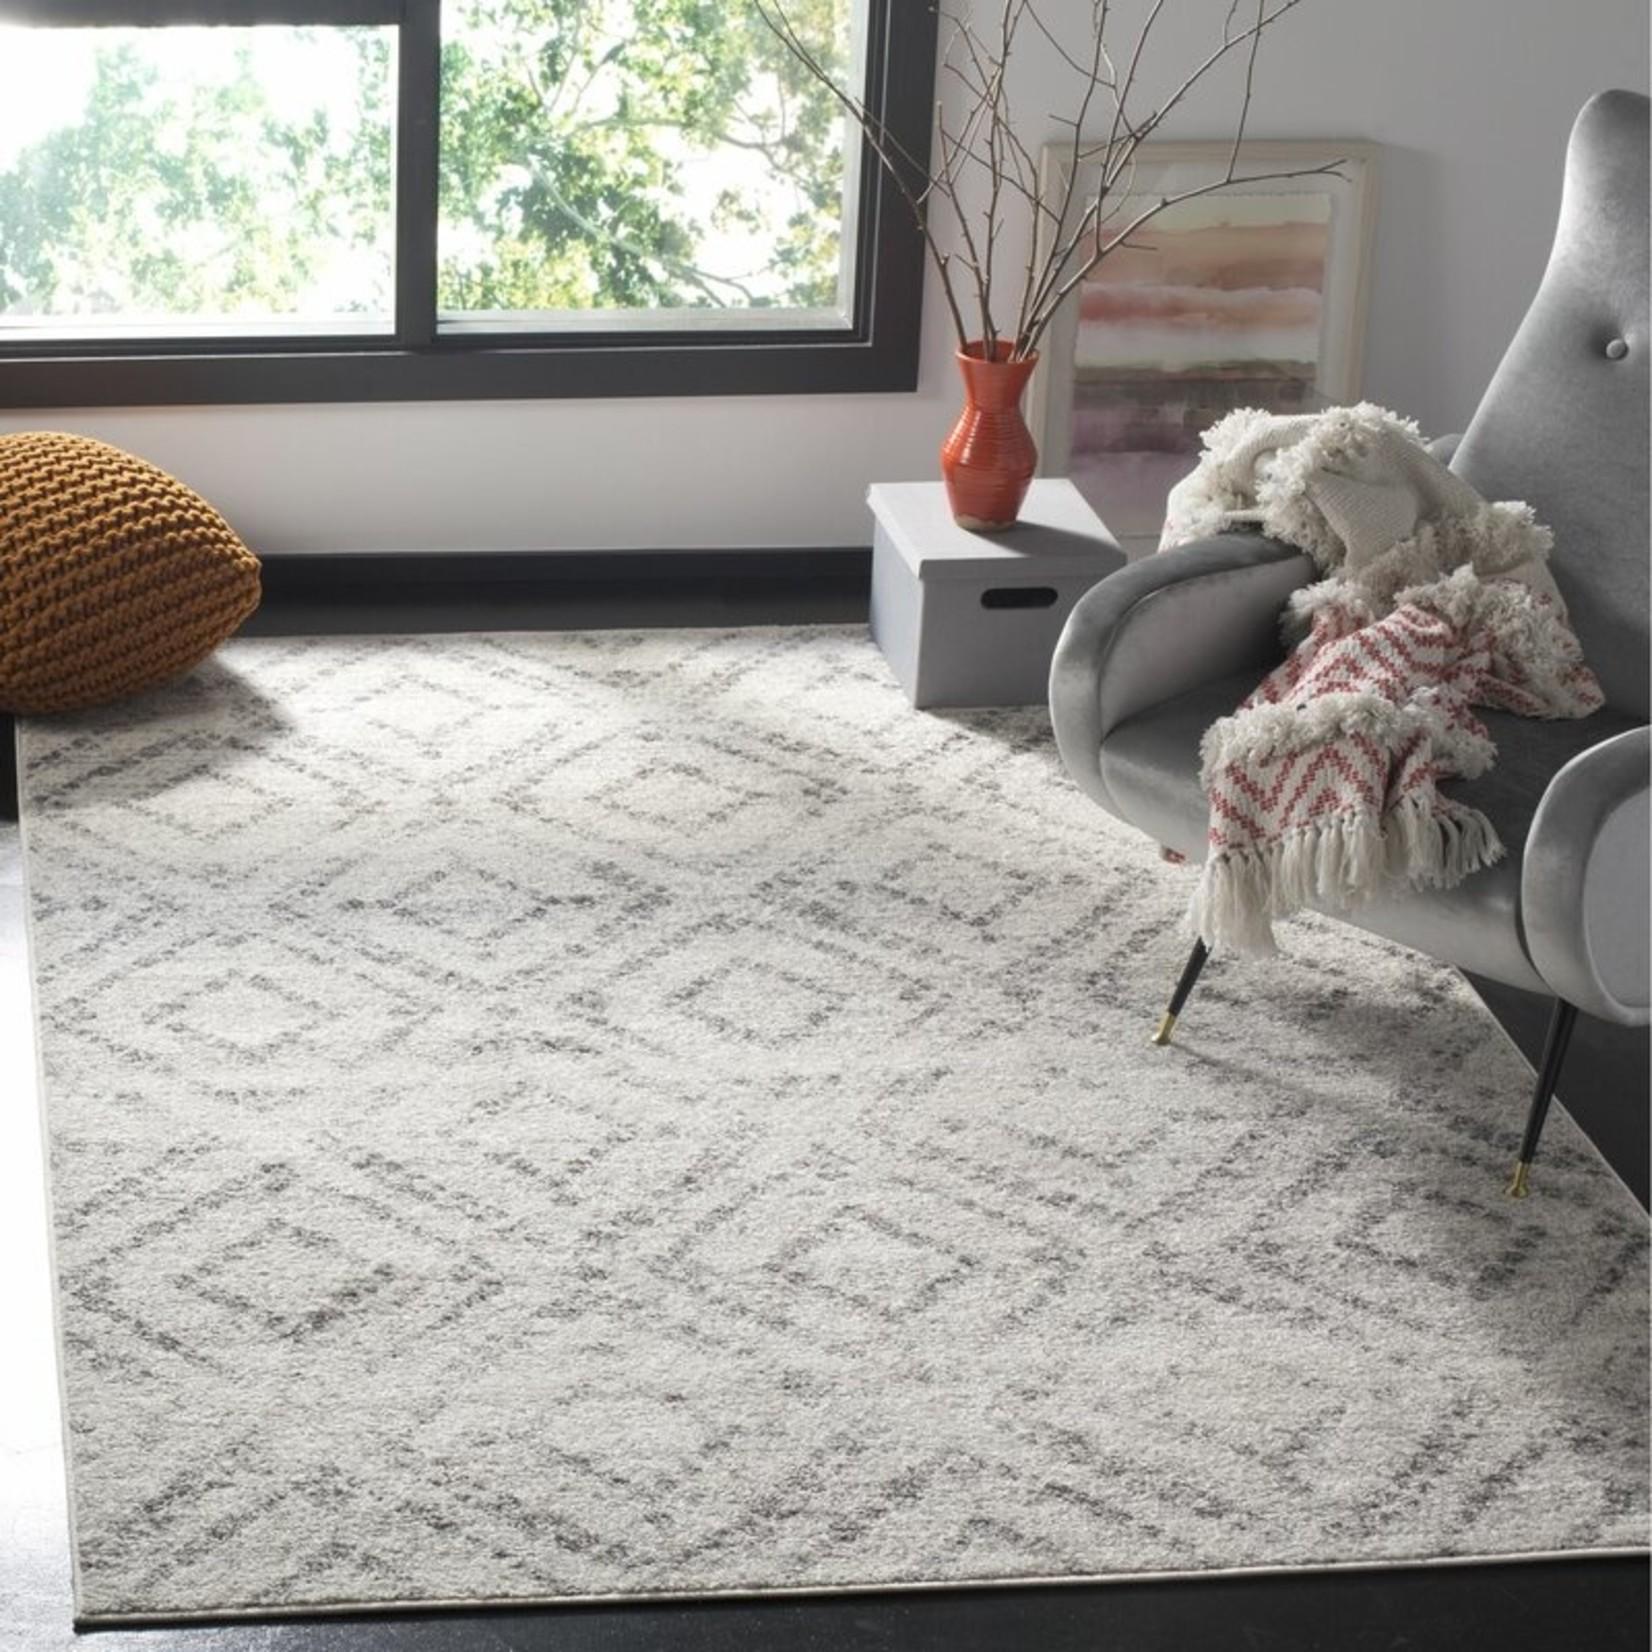 *11' x 15' - Shelva Geometric Light Gray/Gray Area Rug